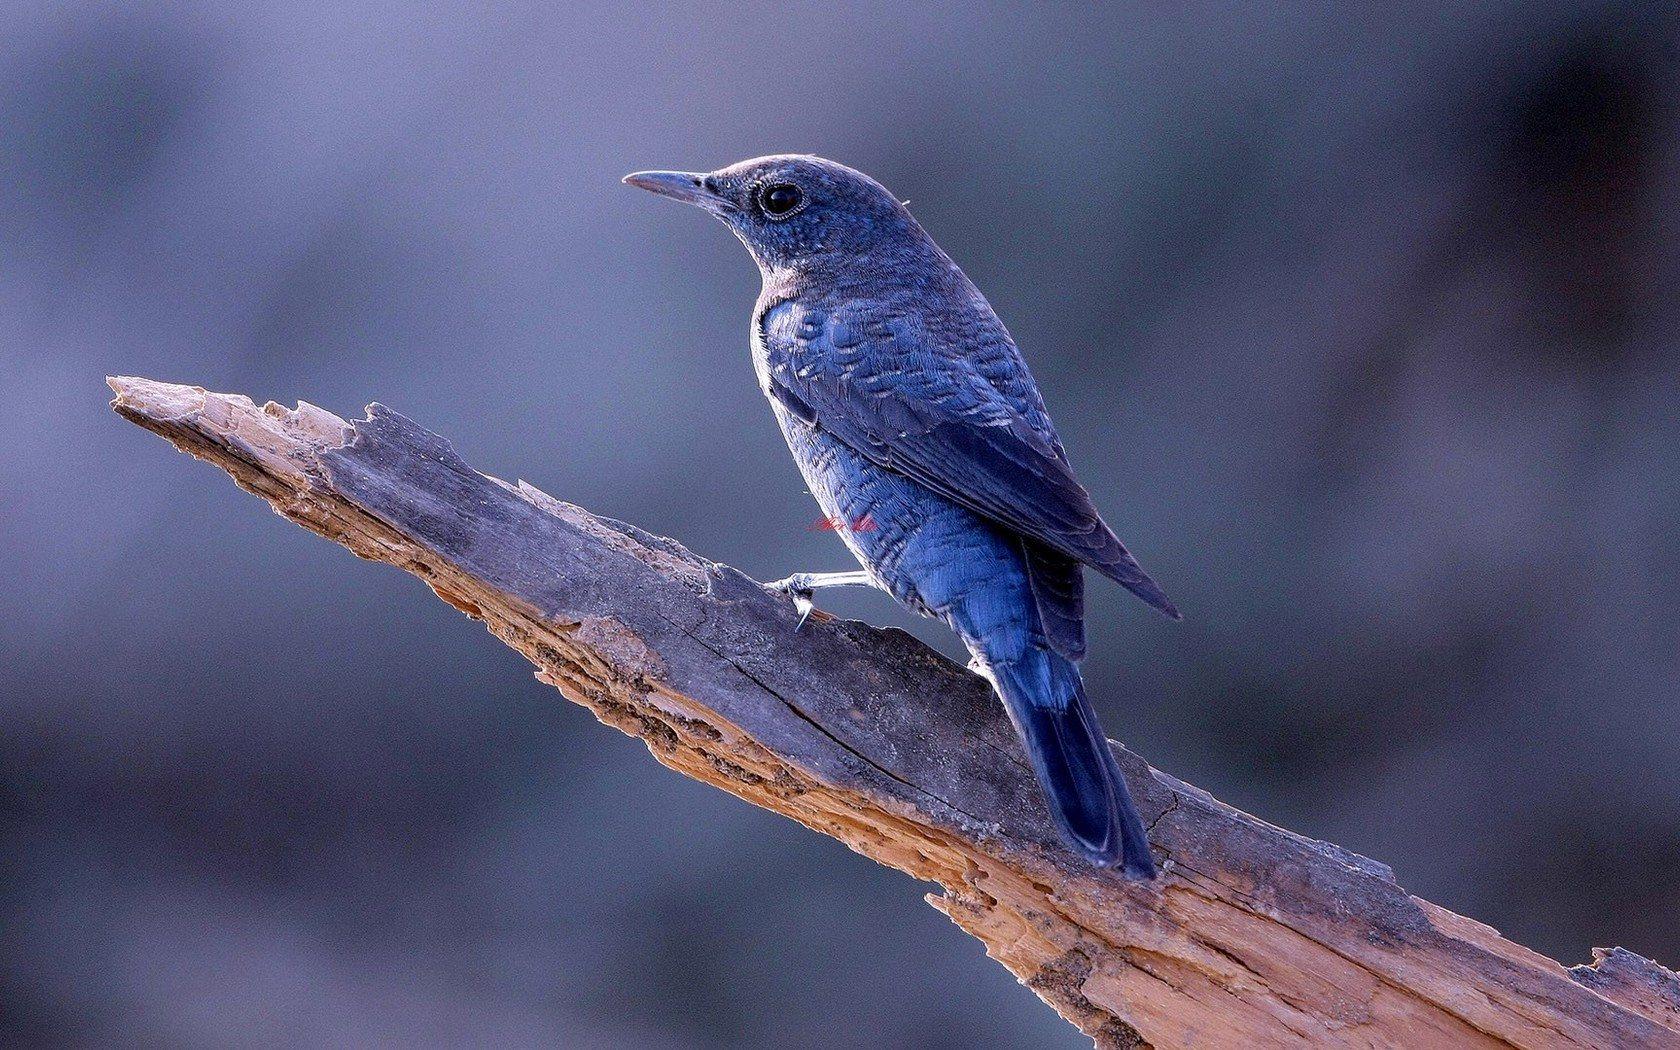 Pin Wallpaper Blue Bird Download Wallpapers Windows 7 on 1680x1050